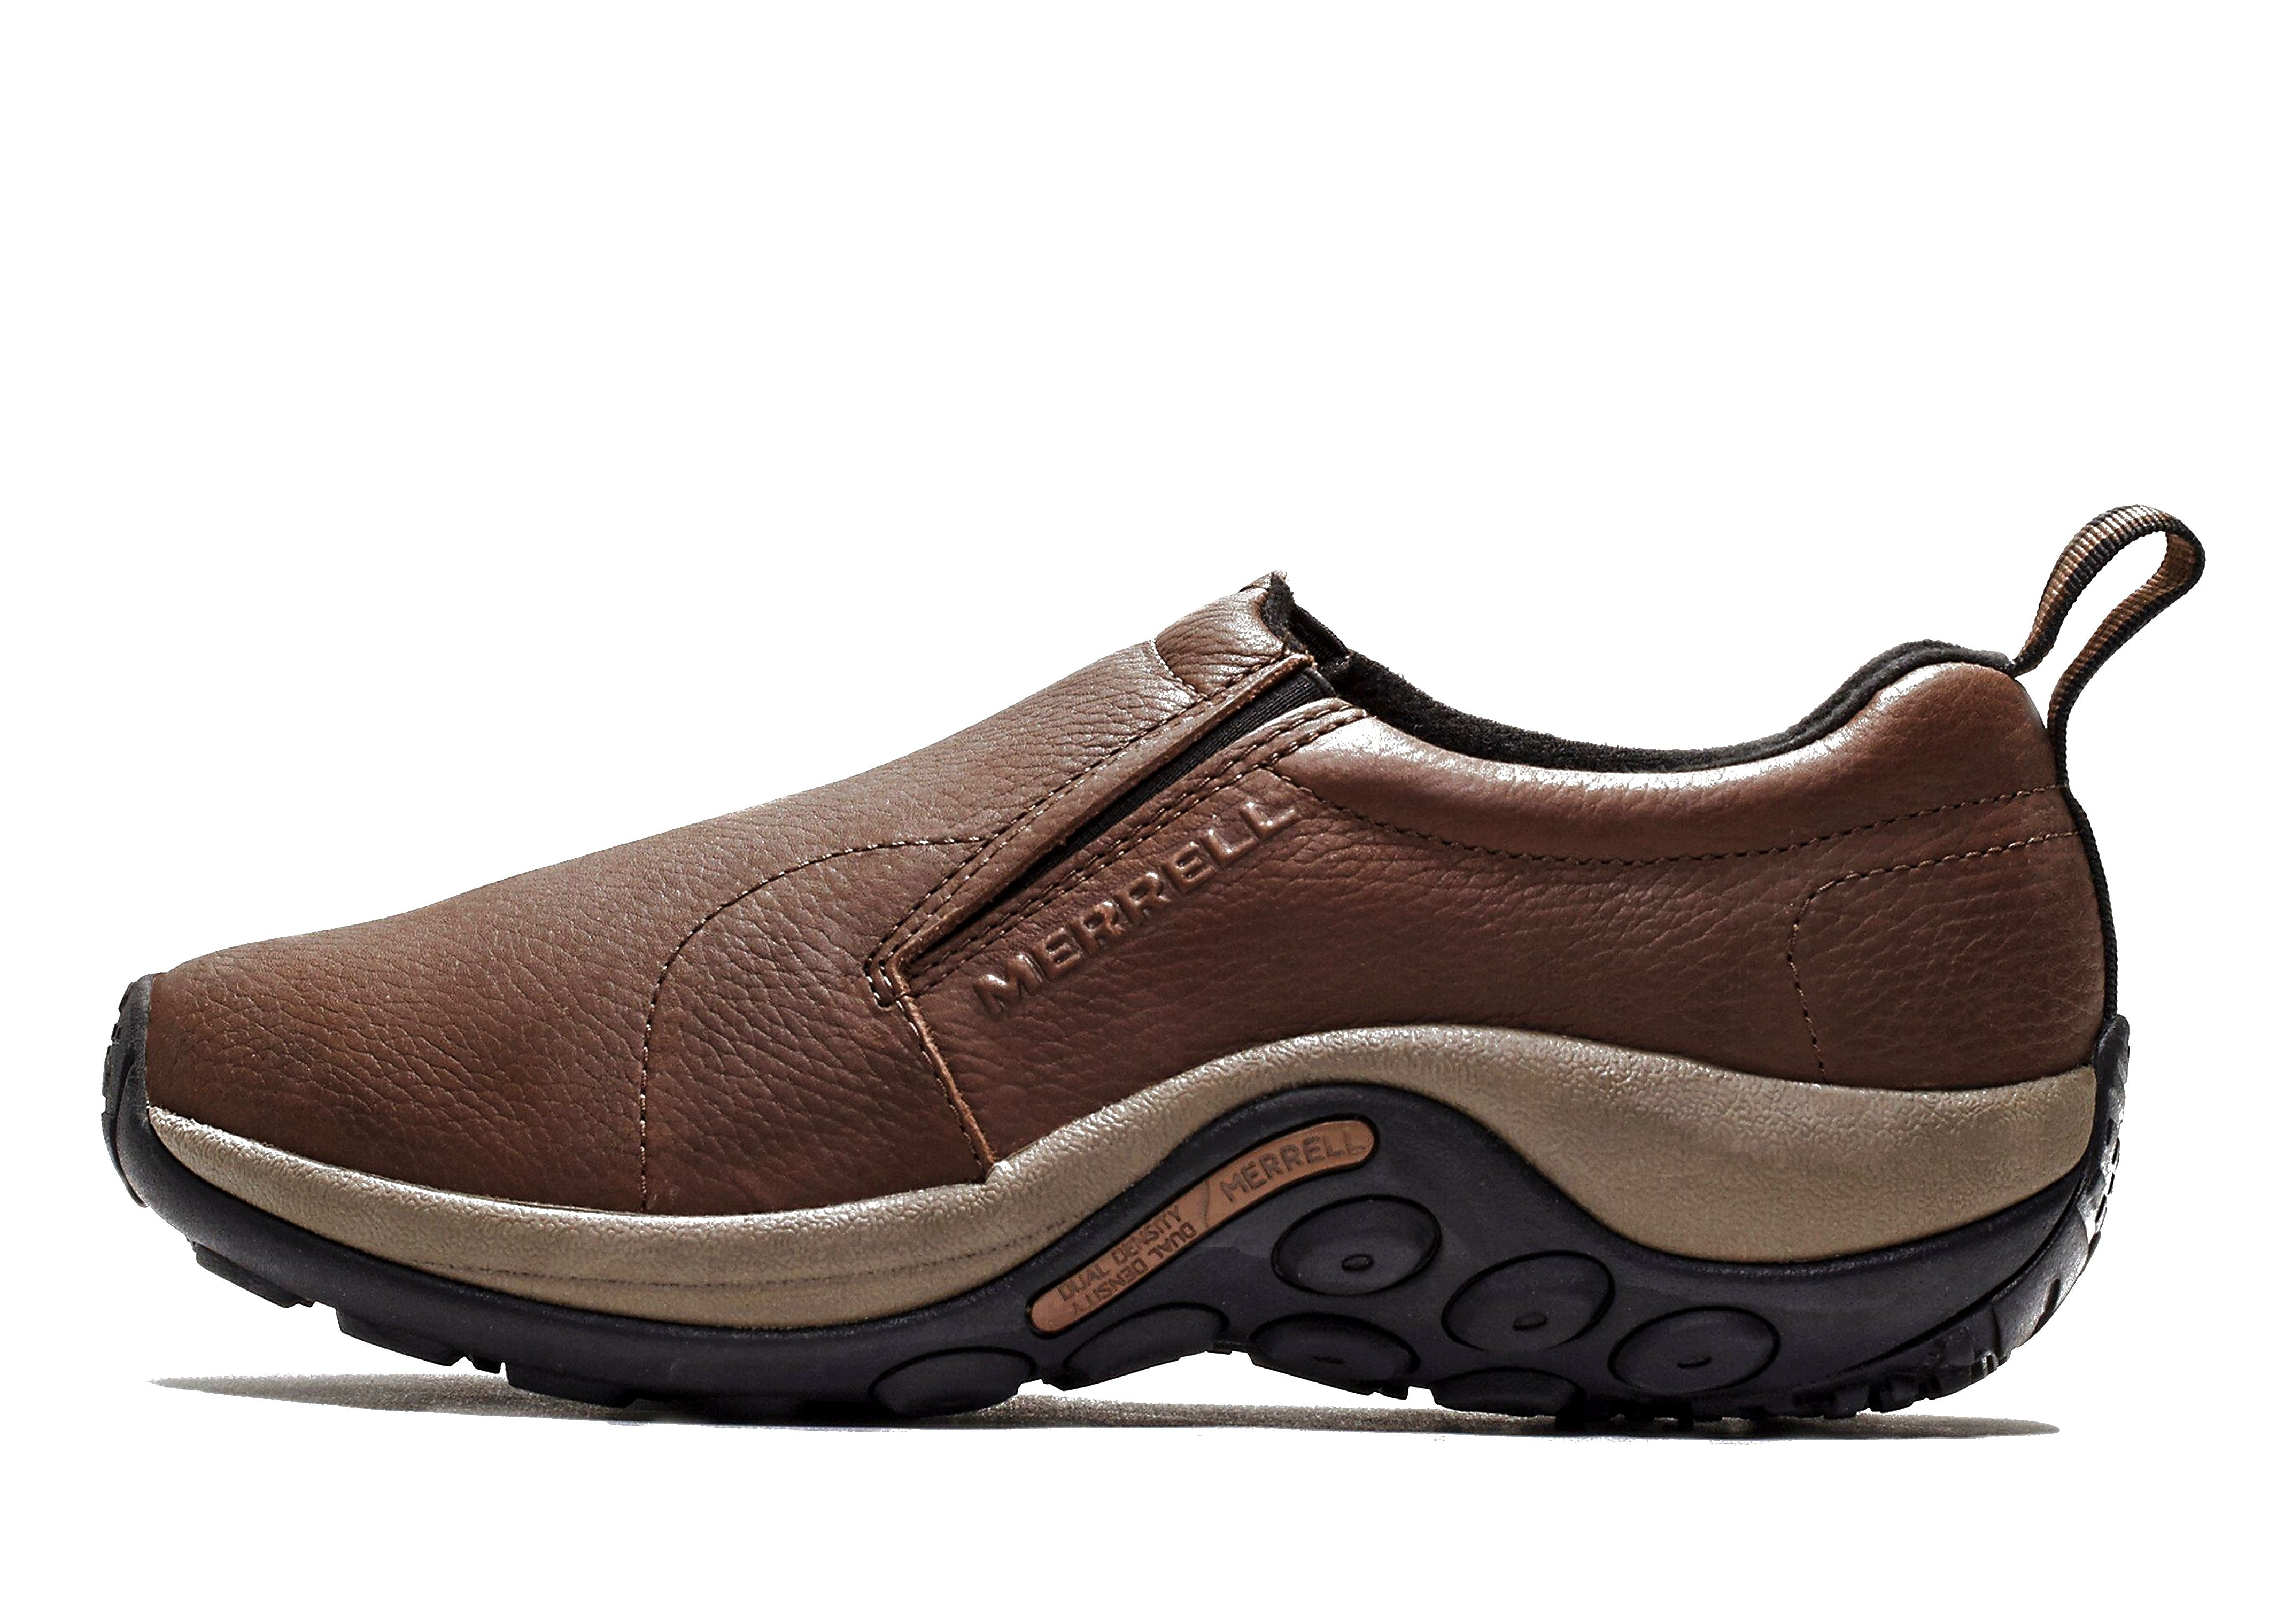 Merrell Jungle Moc Walking Shoes